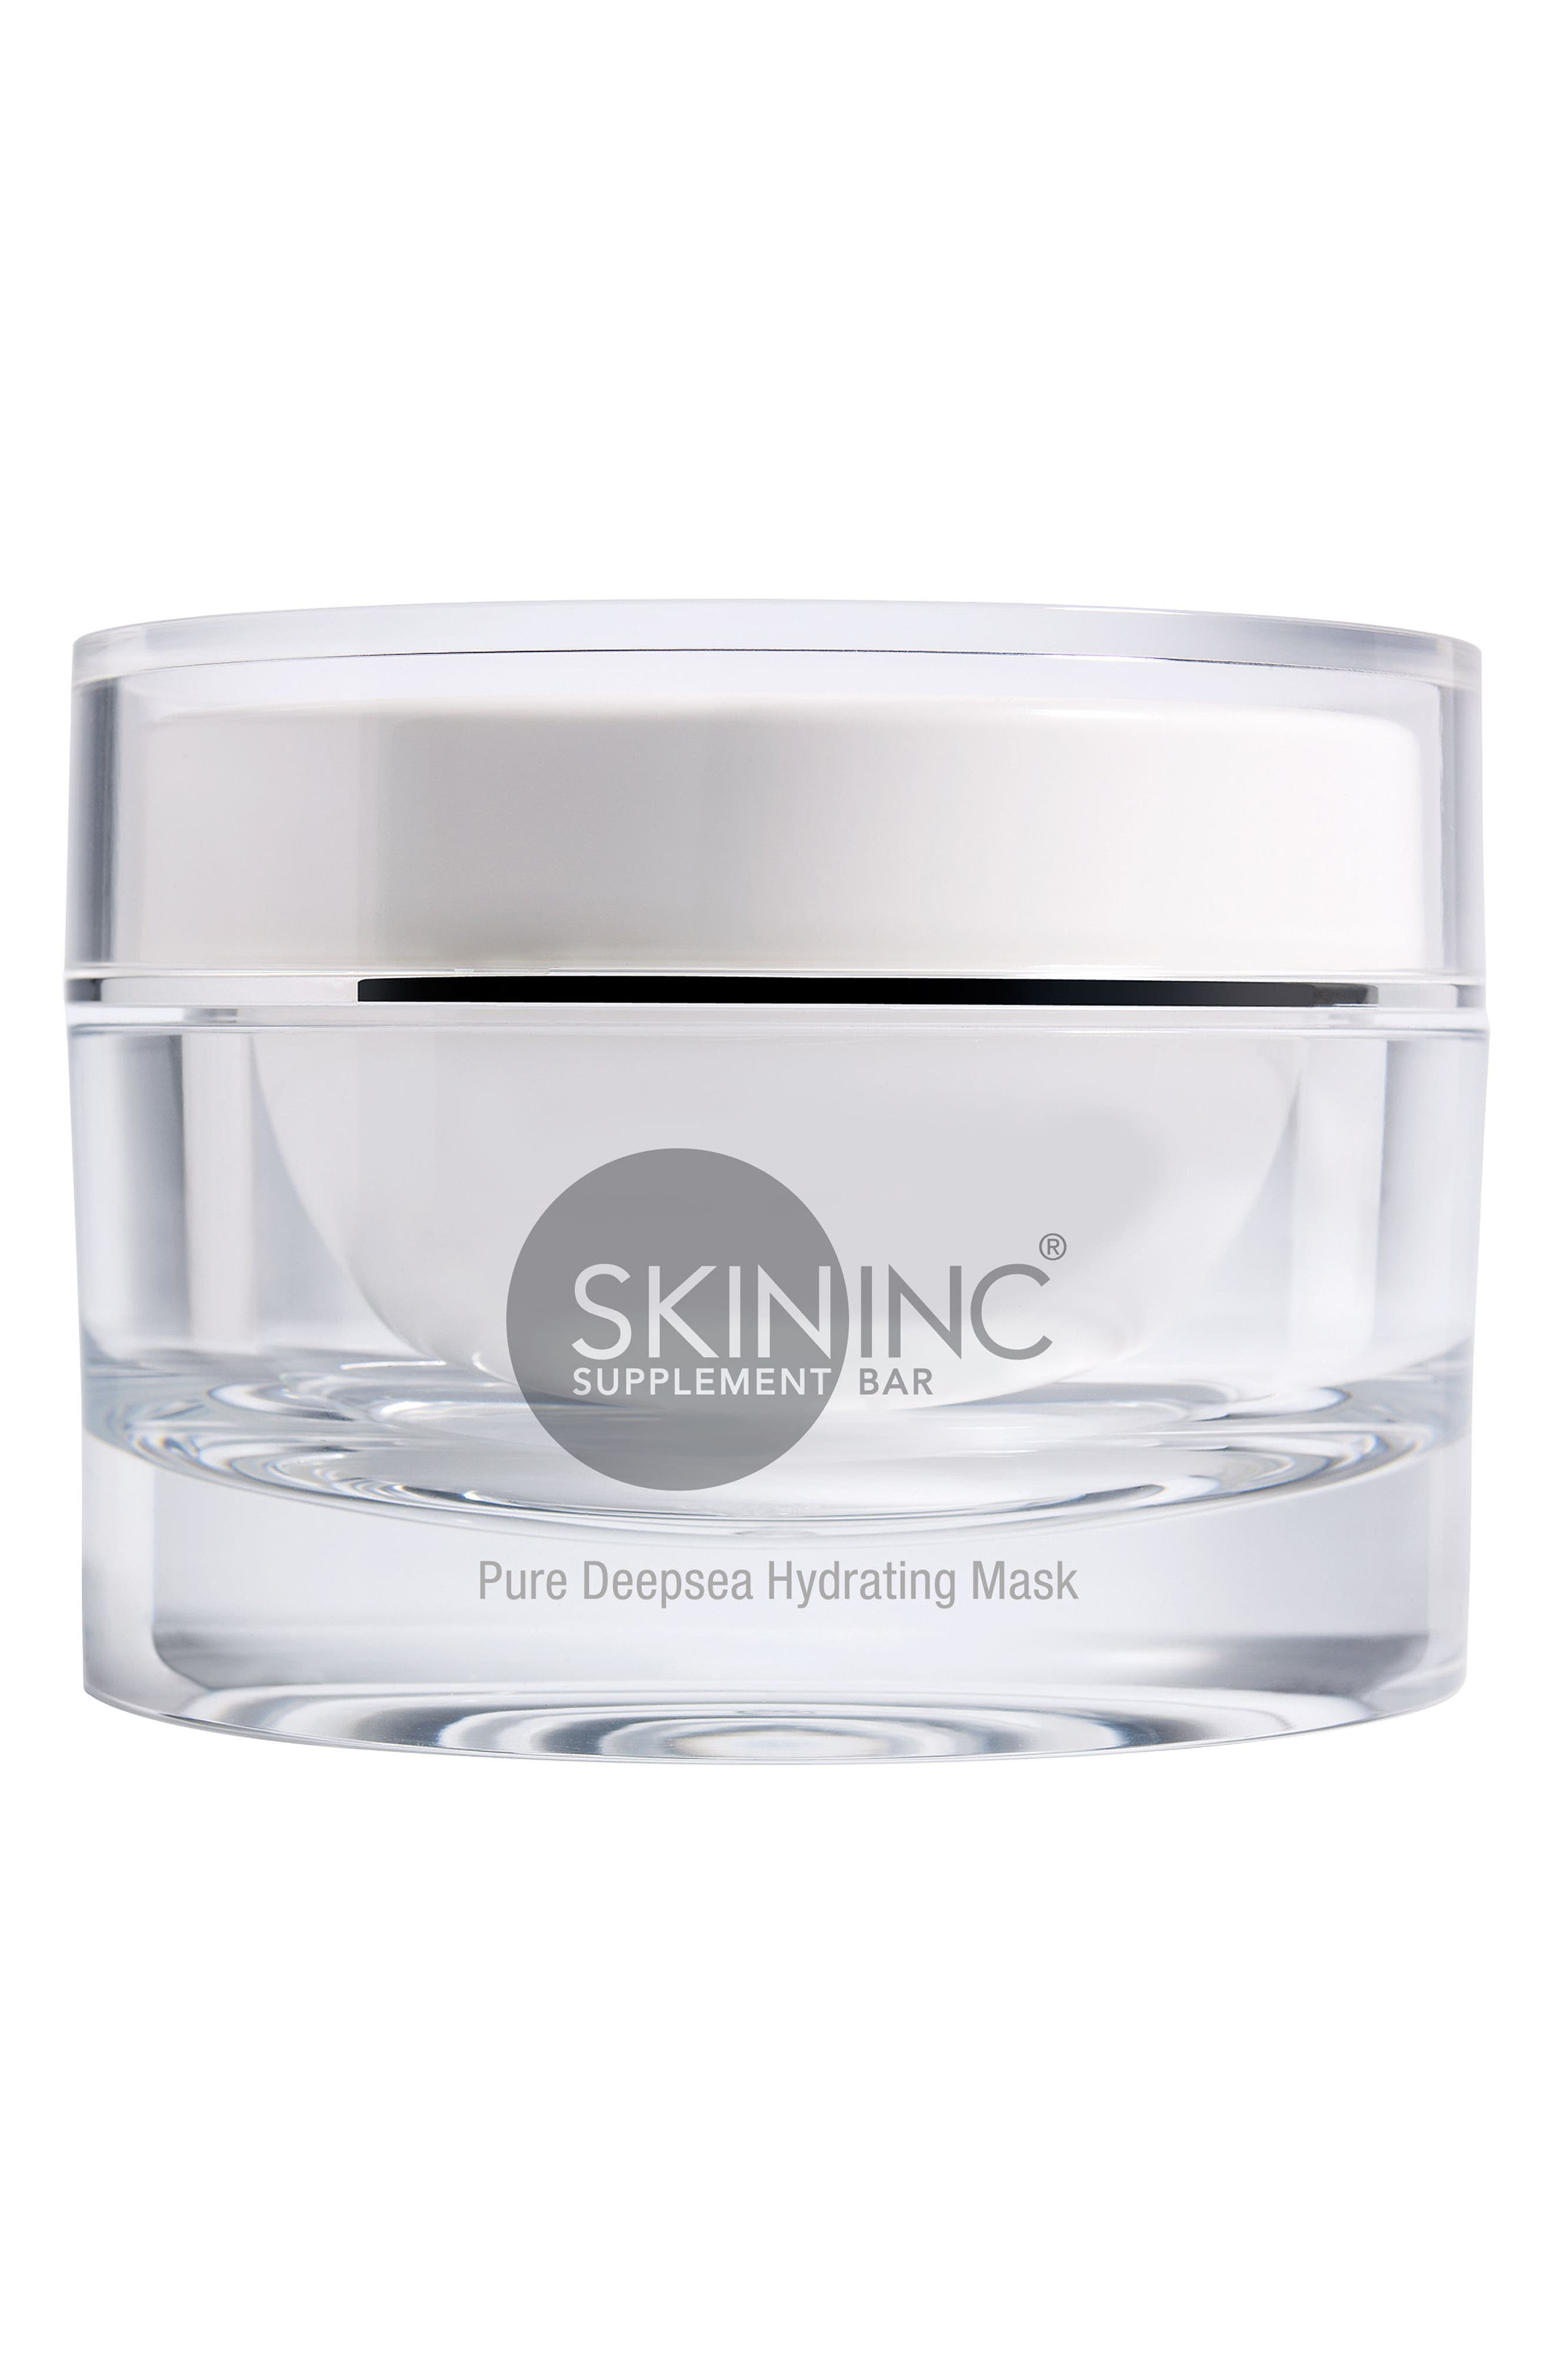 SKIN INC,                              Pure Deepsea Hydrating Mask,                             Main thumbnail 1, color,                             NO COLOR